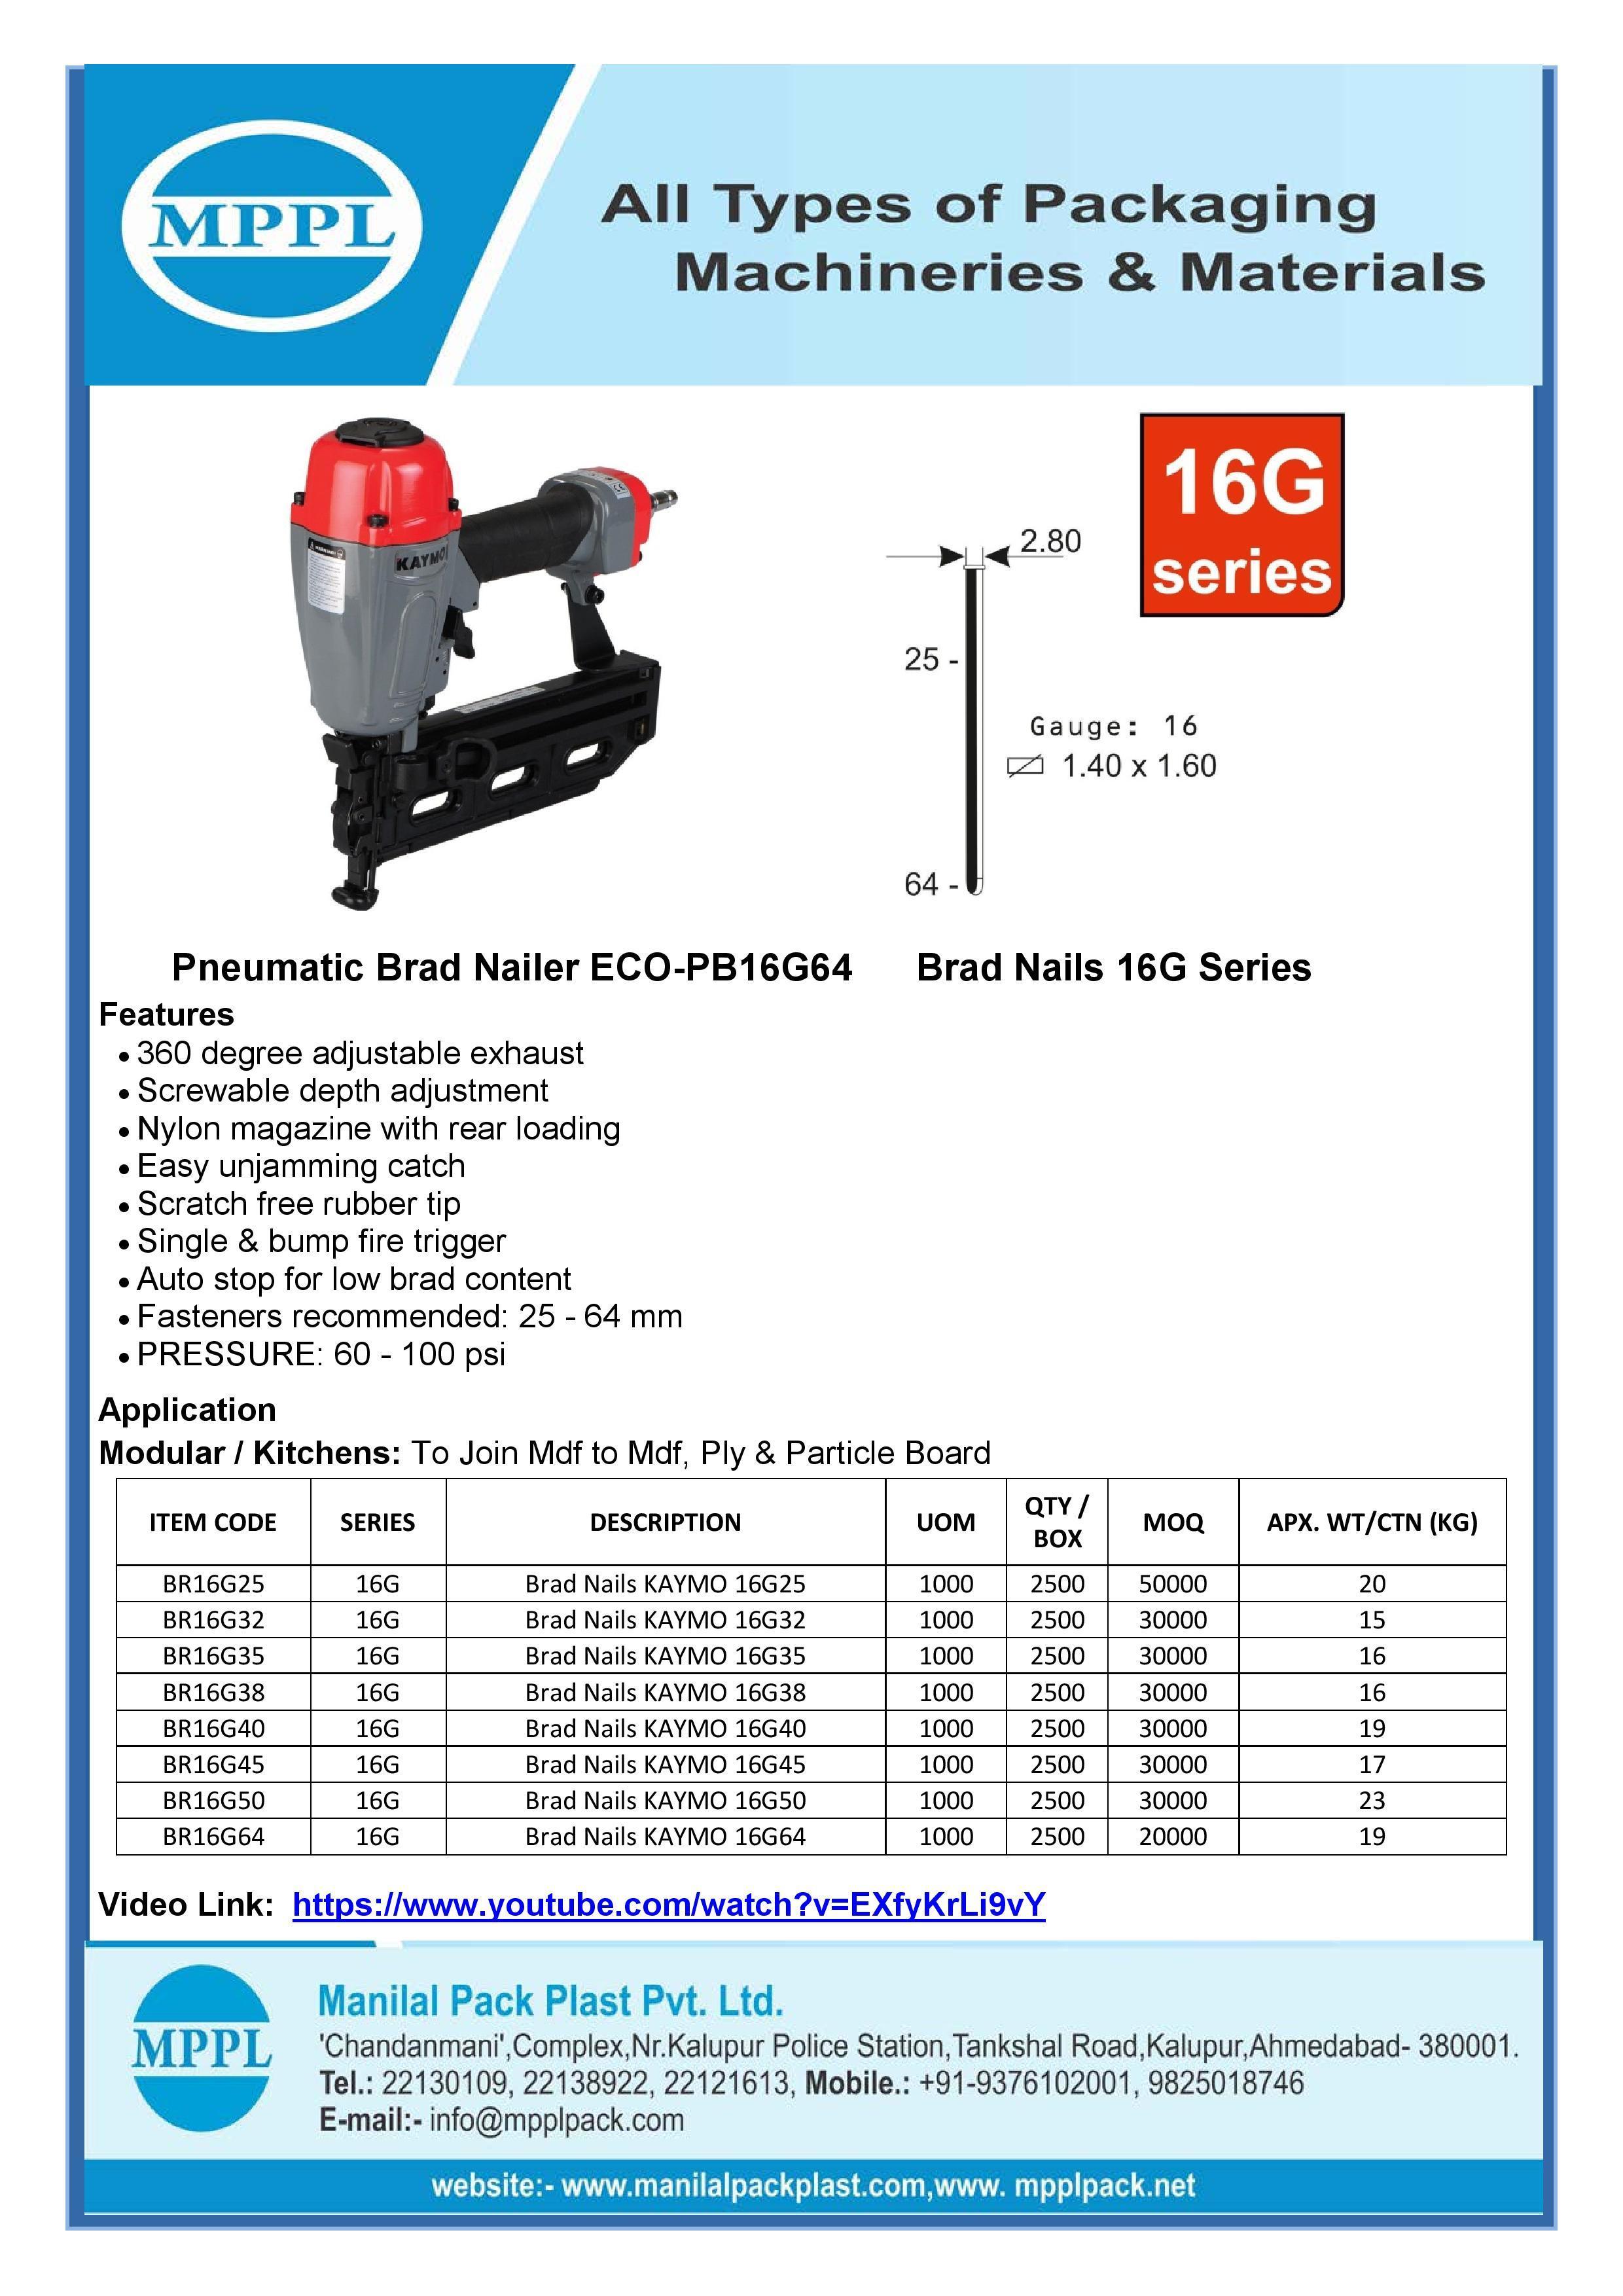 Pneumatic Brad Nailer ECO-PB16G64